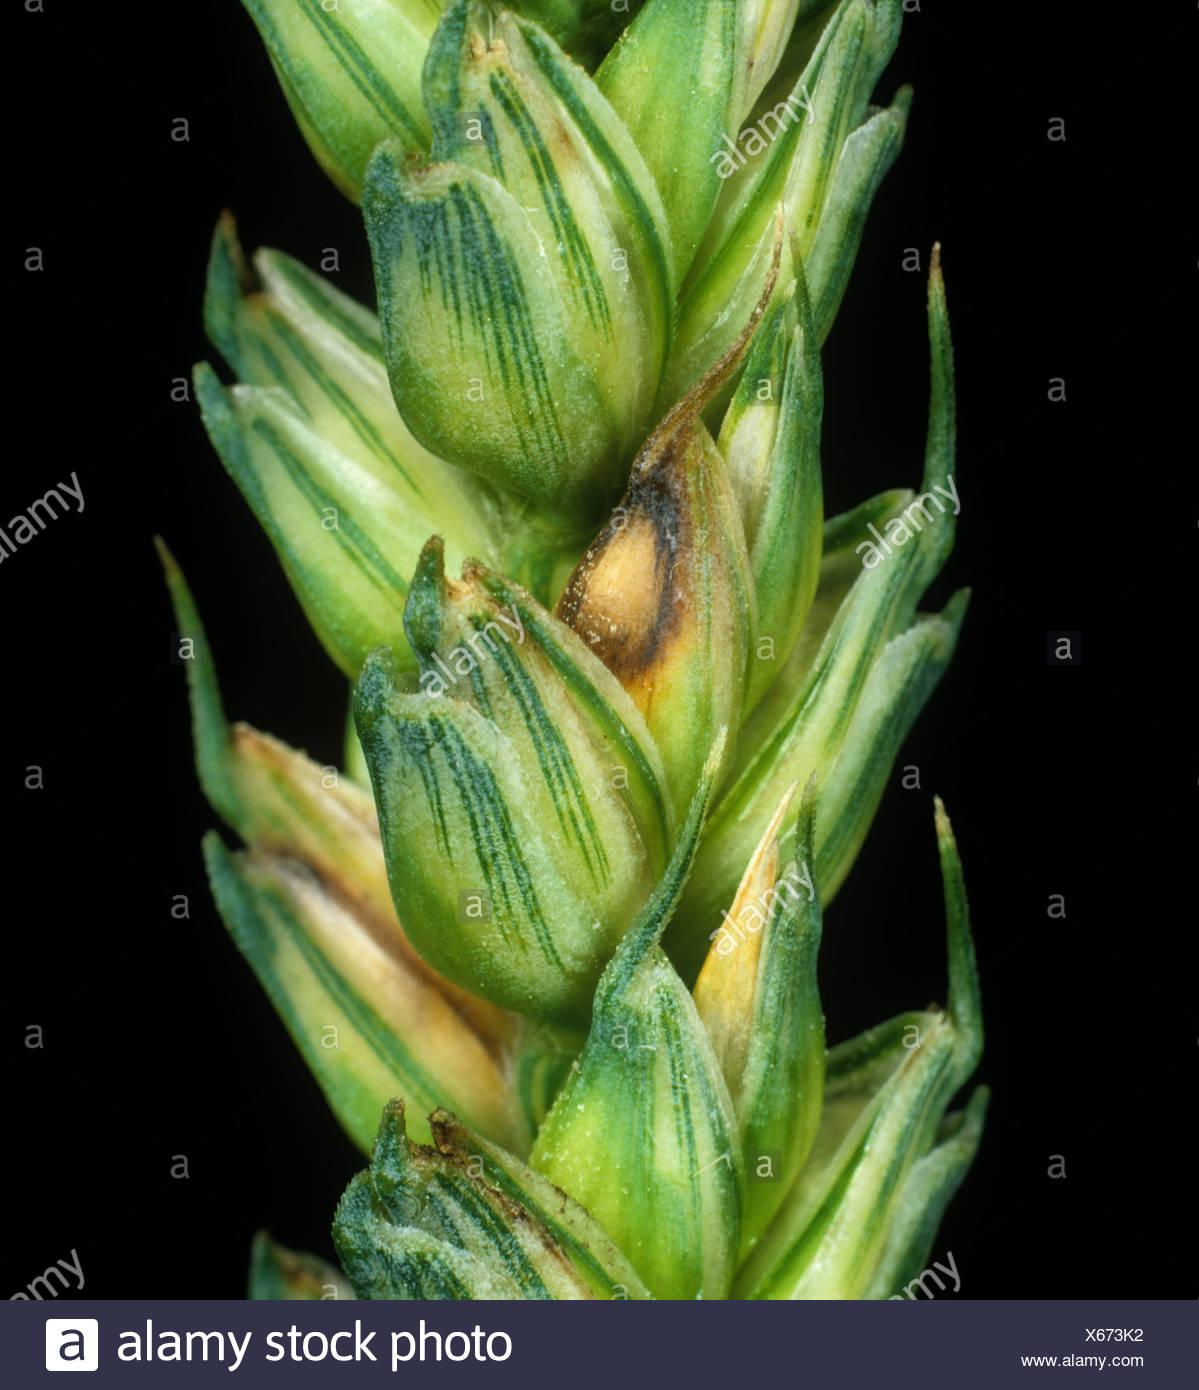 Head scab or ear blight (Fusarium poae) infected grain on